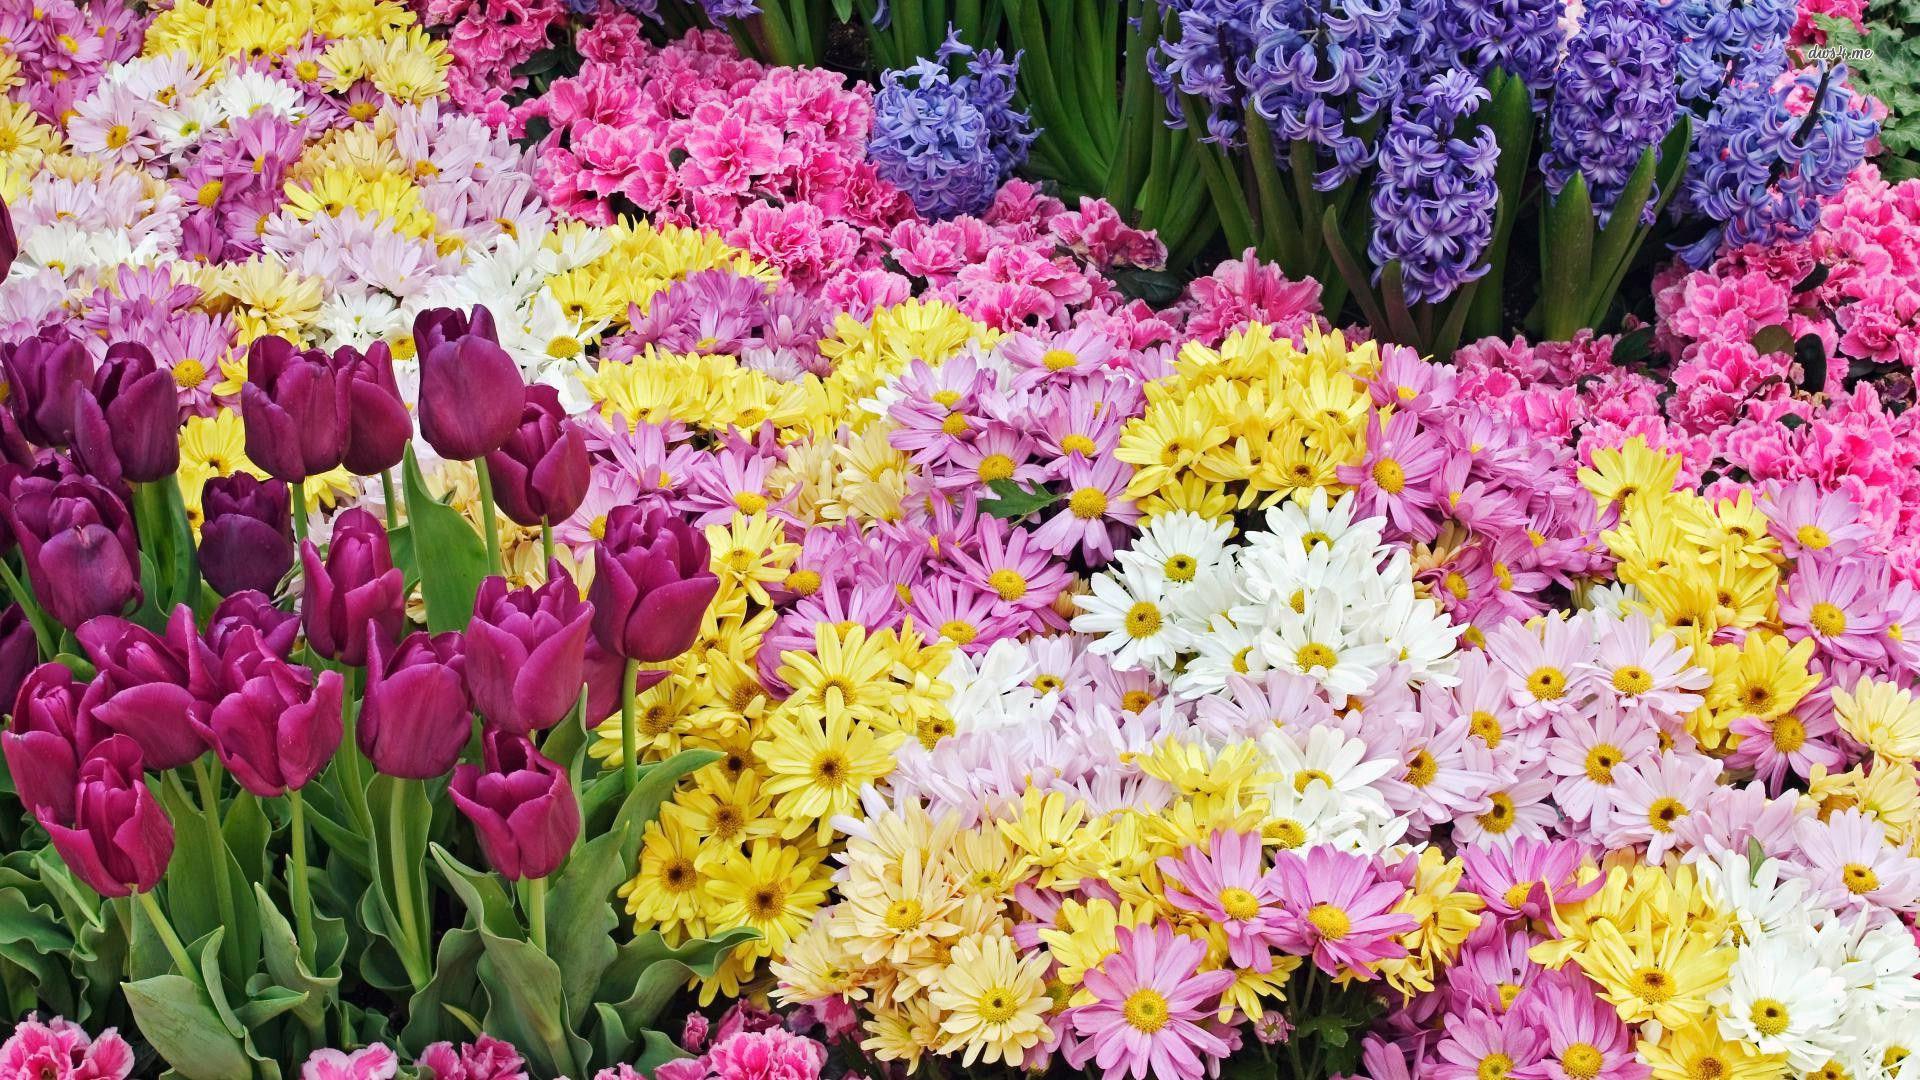 spring flowers desktop wallpaper 1920x1080